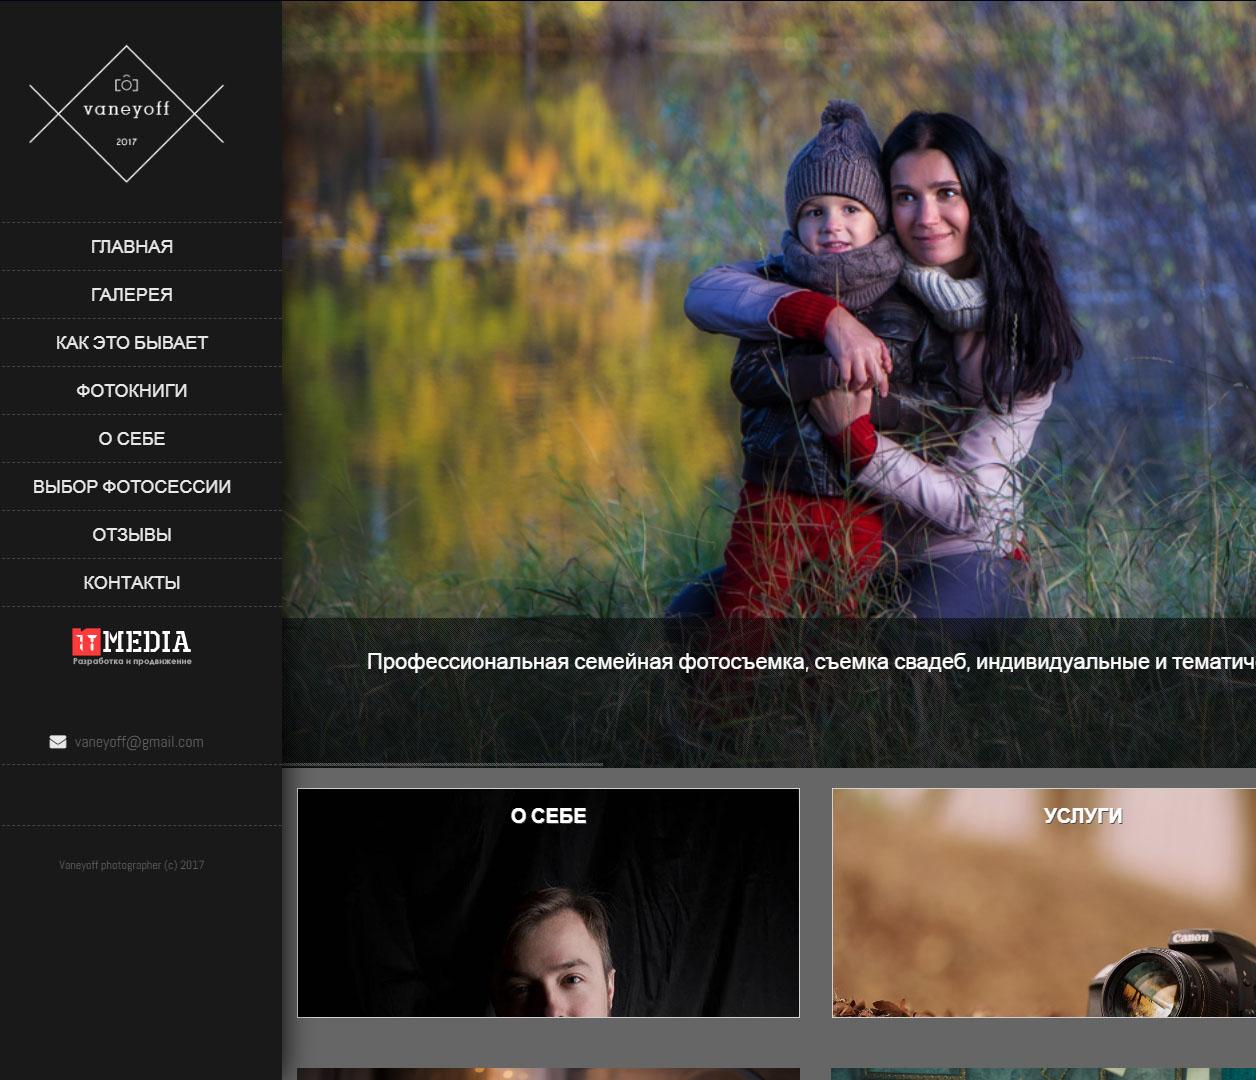 Корпоративный сайт фотограф Ивана Овчинникова (г.Сургут)